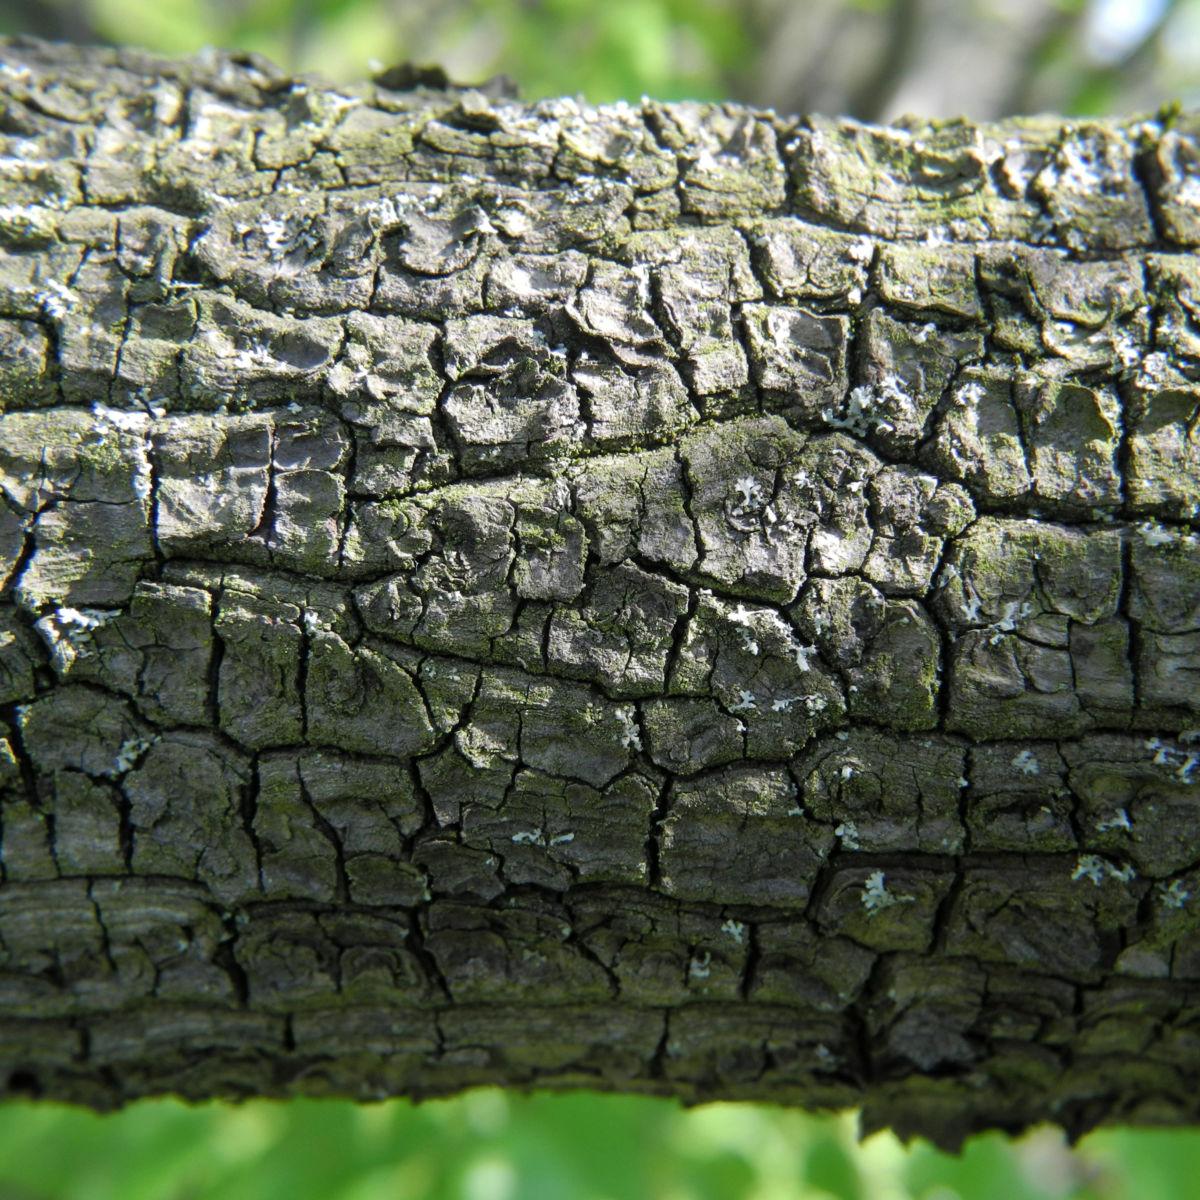 Carolina Maigloeckchenbaum Rinde grau Halesia carolina